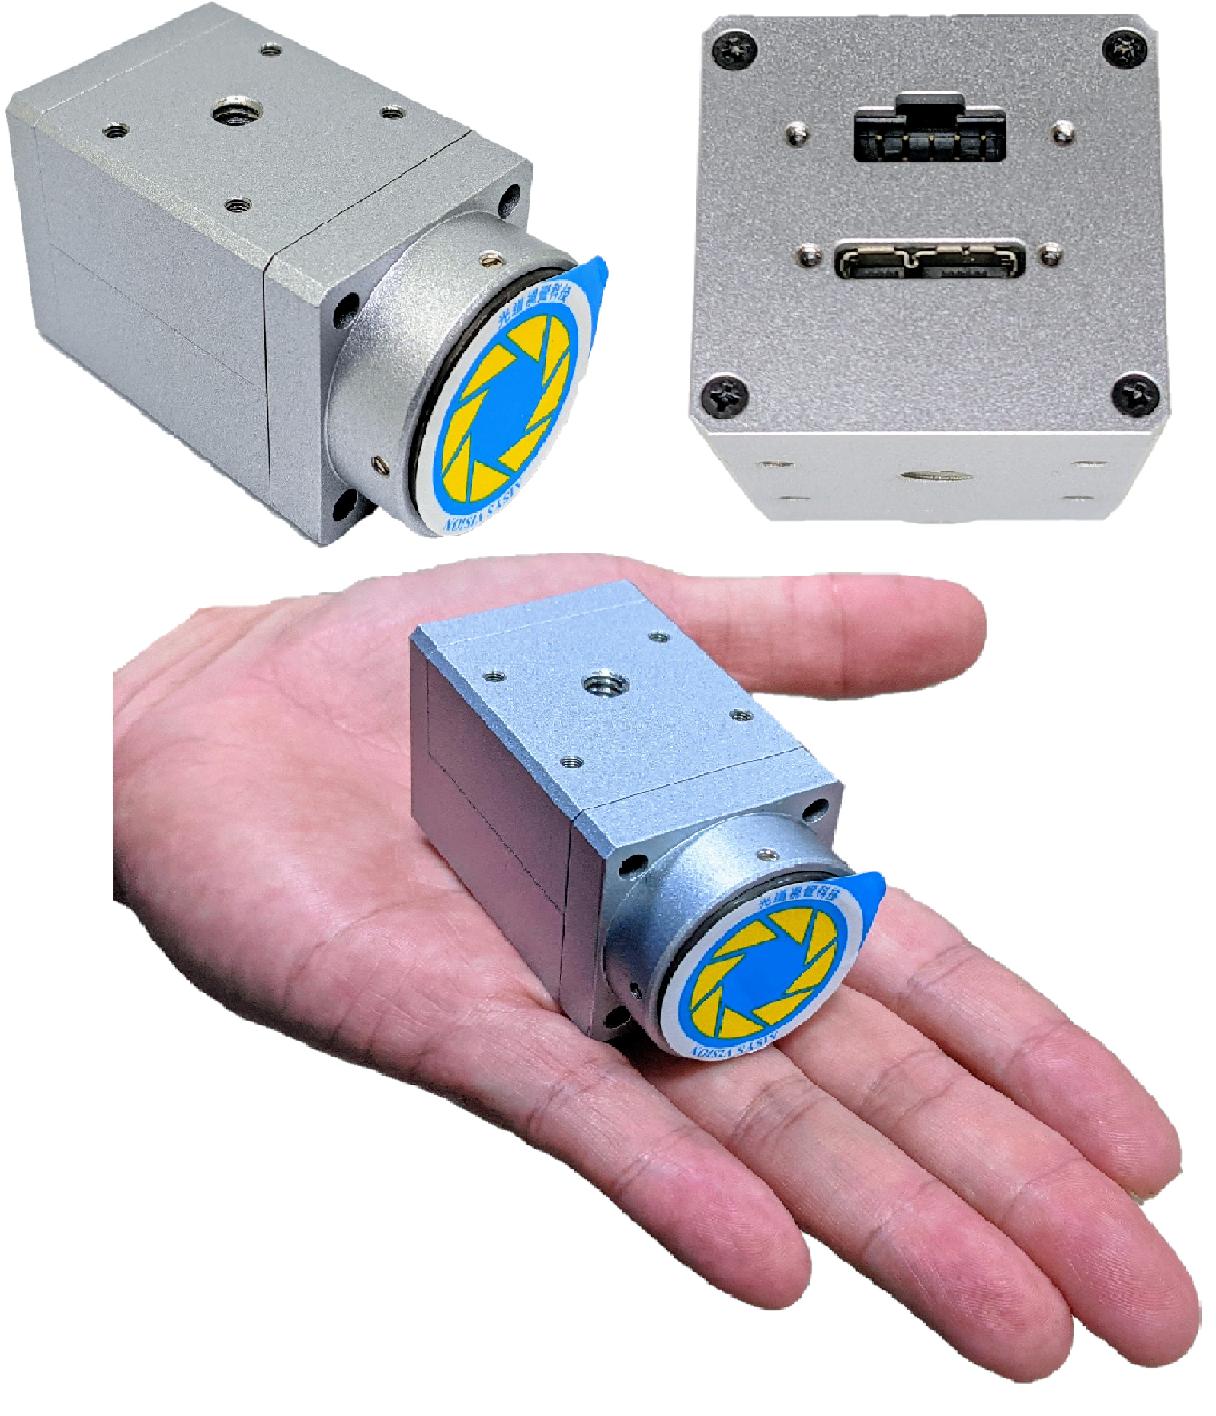 CYCLOPS SU500-14攝影機-5.0M像素、內同步式、灰階、內建LED燈源控制器